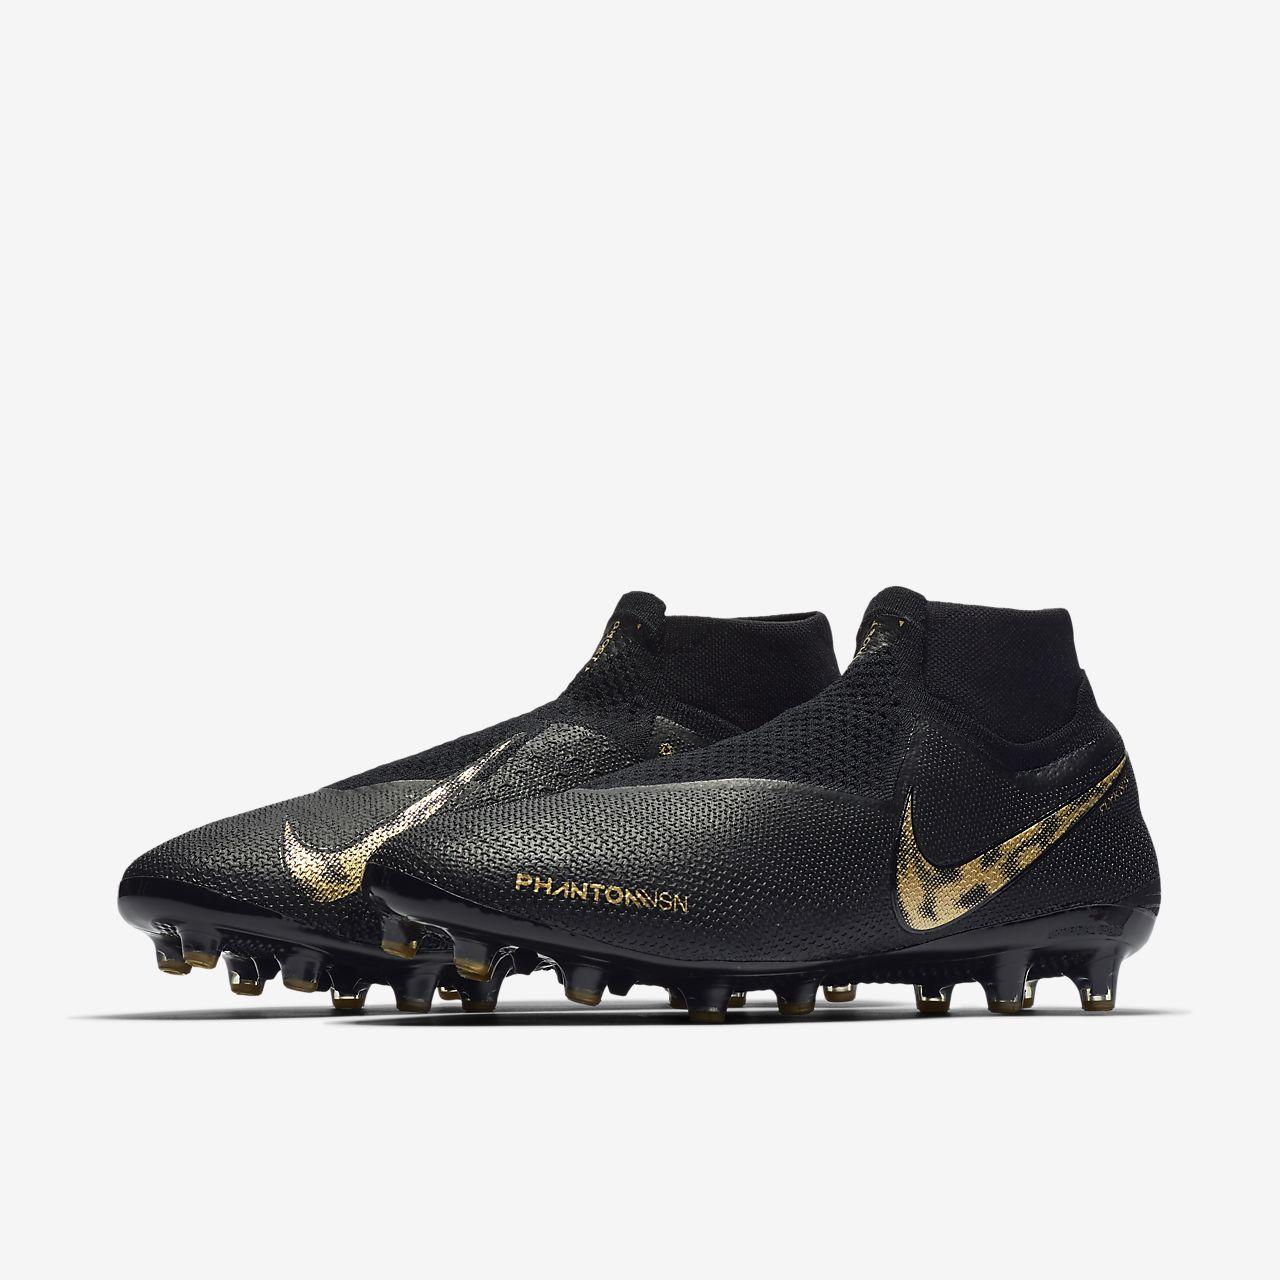 19b5d4c37f4 ... Nike Phantom Vision Elite Dynamic Fit Botas de fútbol para césped  artificial